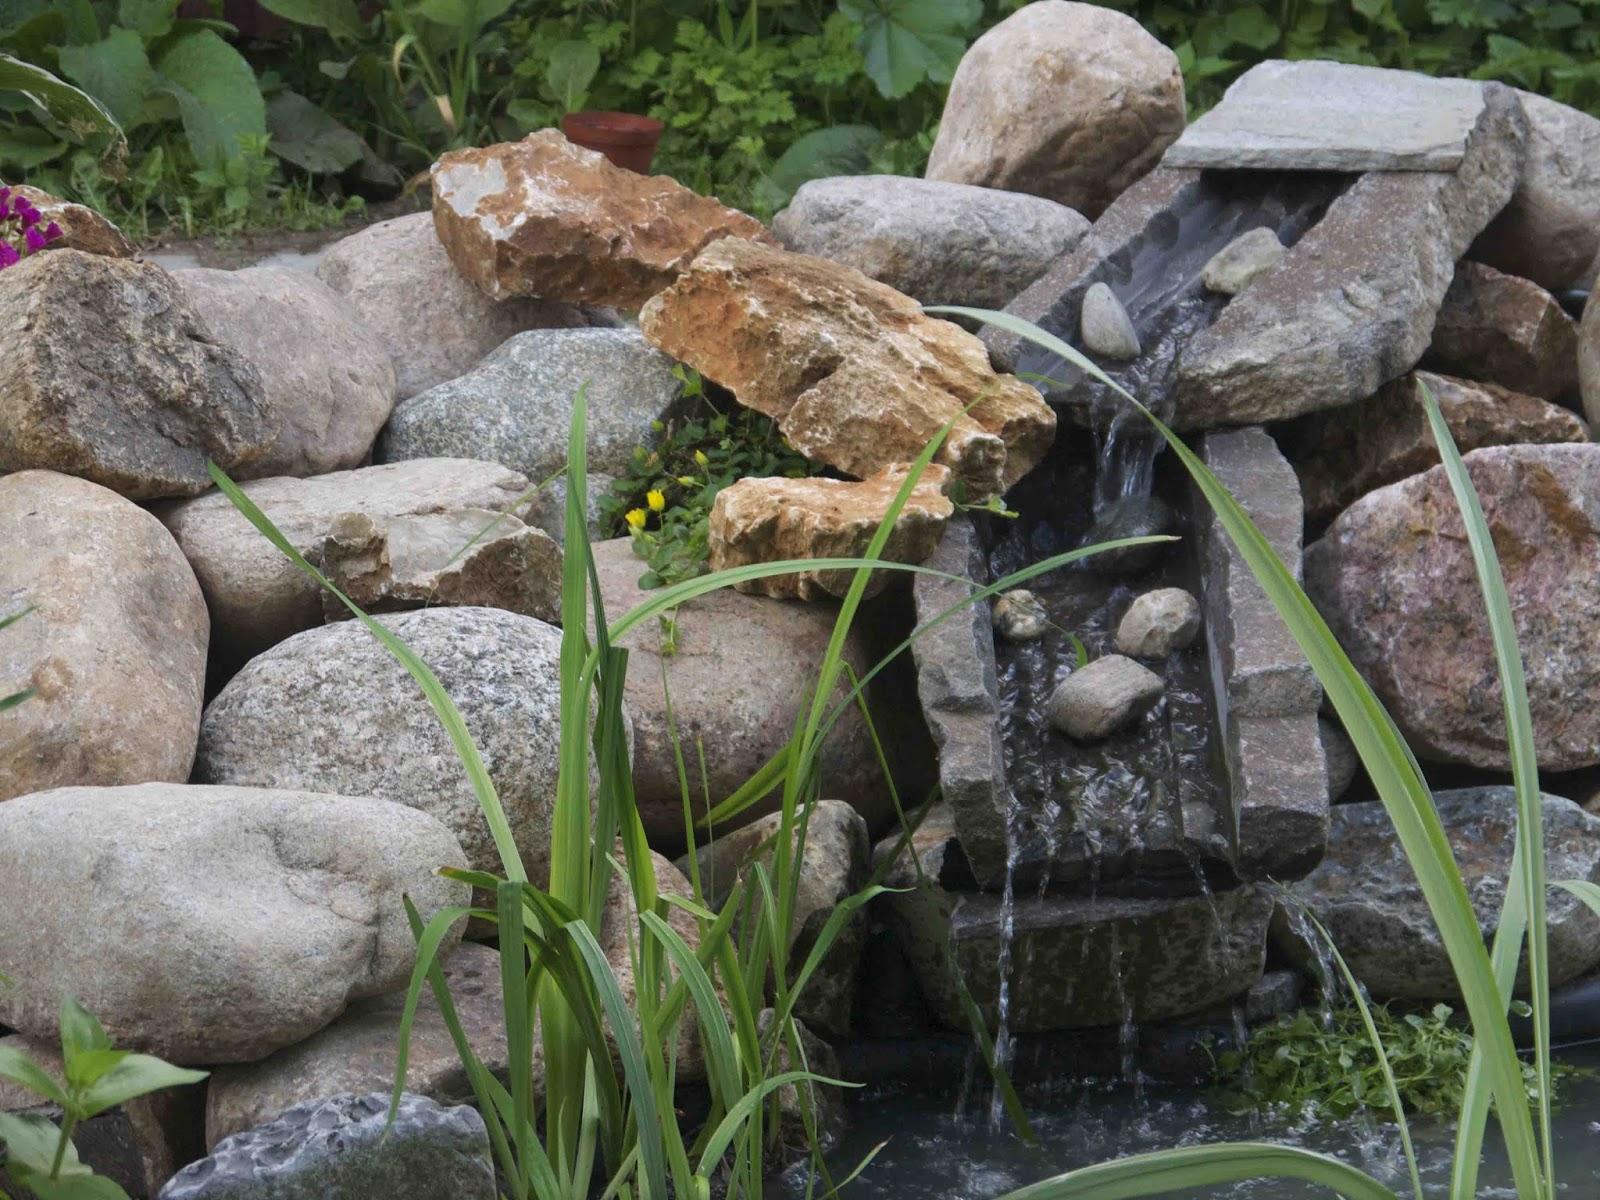 Lille vandfald i haven